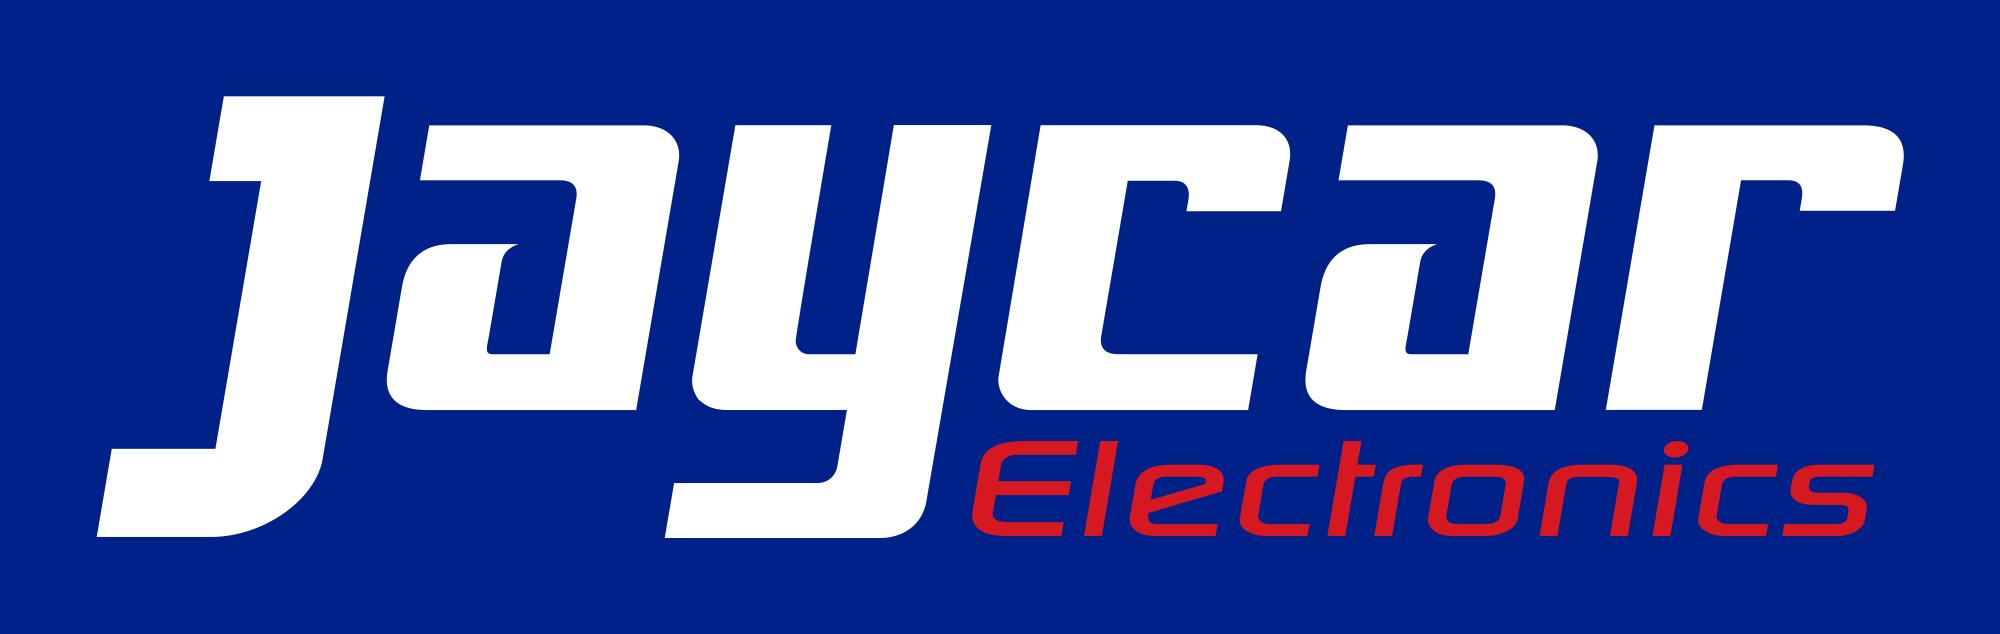 Electronics Store in NSW Sydney 2000 Jaycar Electronics 127 York Street Opposite Qvb 0292671614